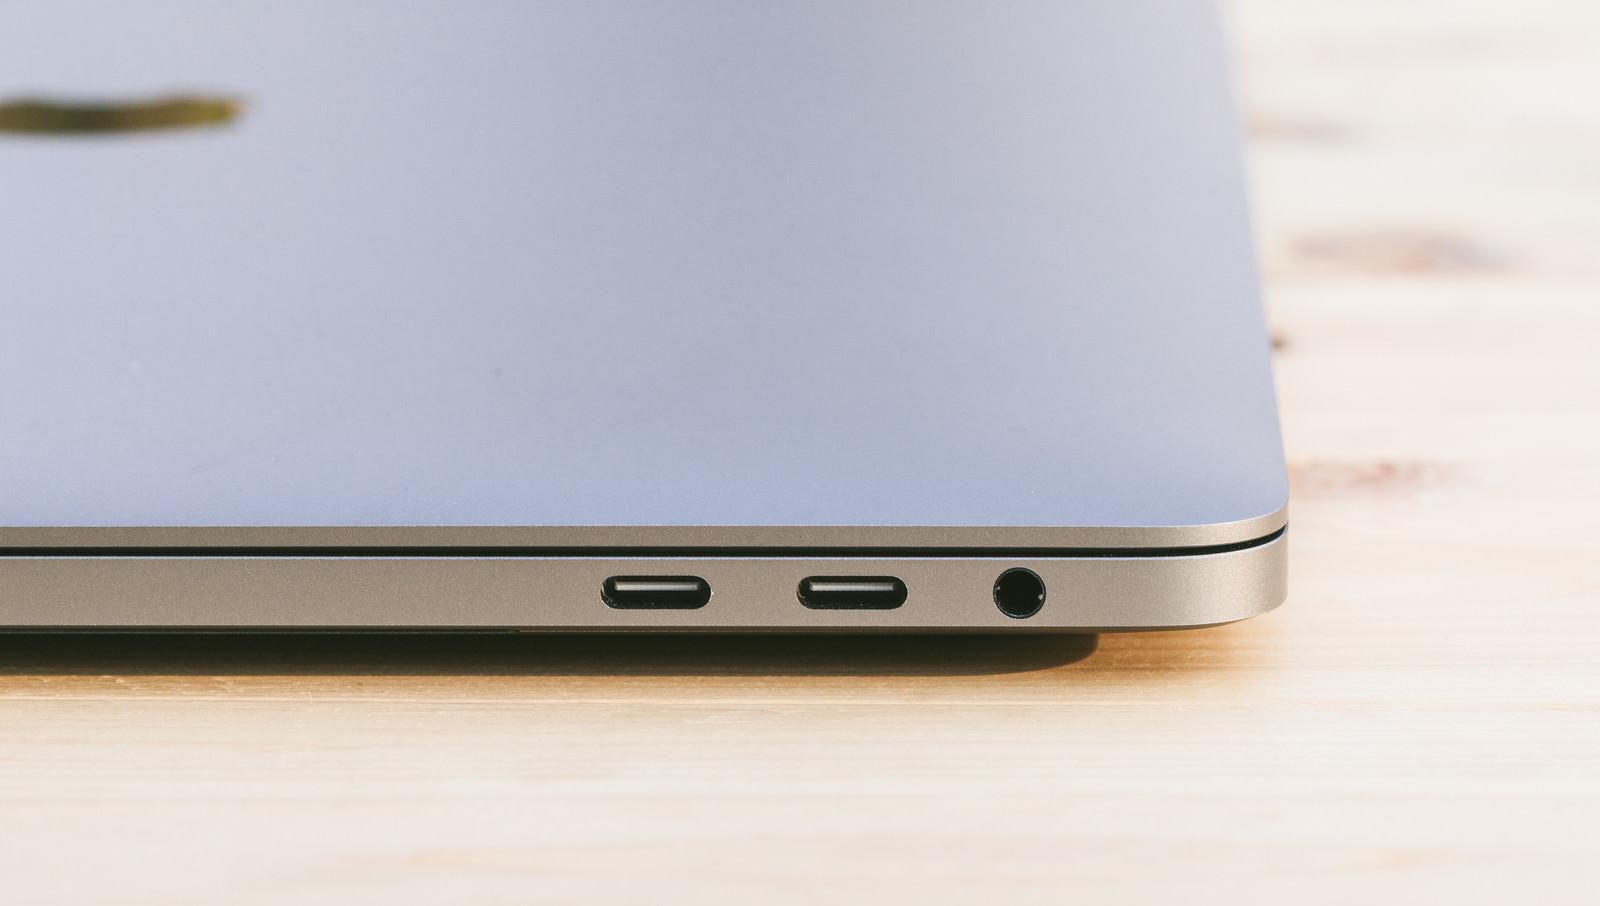 「USB-C/Thunderbolt 3 に統一されてデザイン性が向上したMBPUSB-C/Thunderbolt 3 に統一されてデザイン性が向上したMBP」のフリー写真素材を拡大